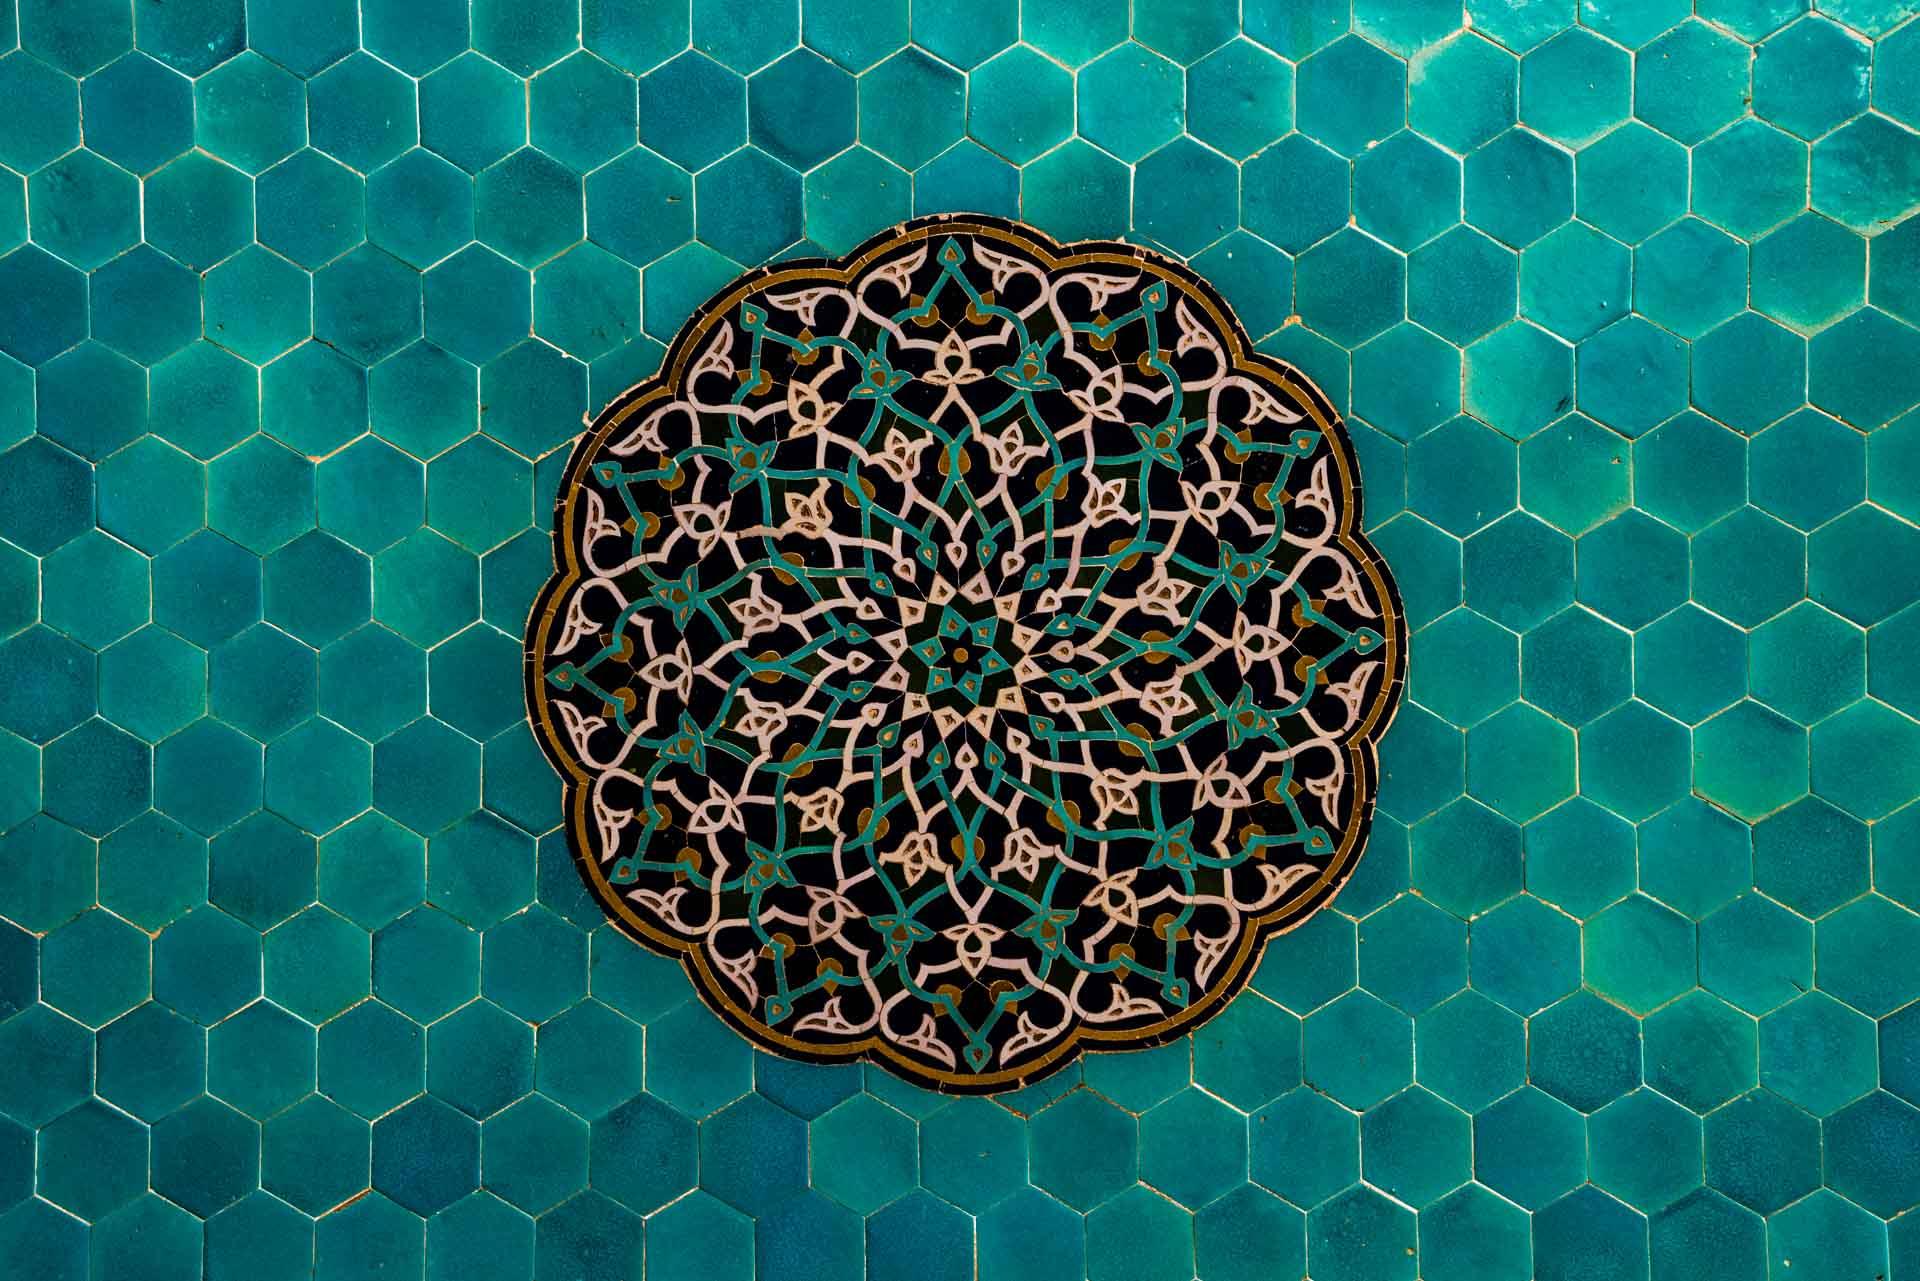 Yazd Jame Mosque tile work